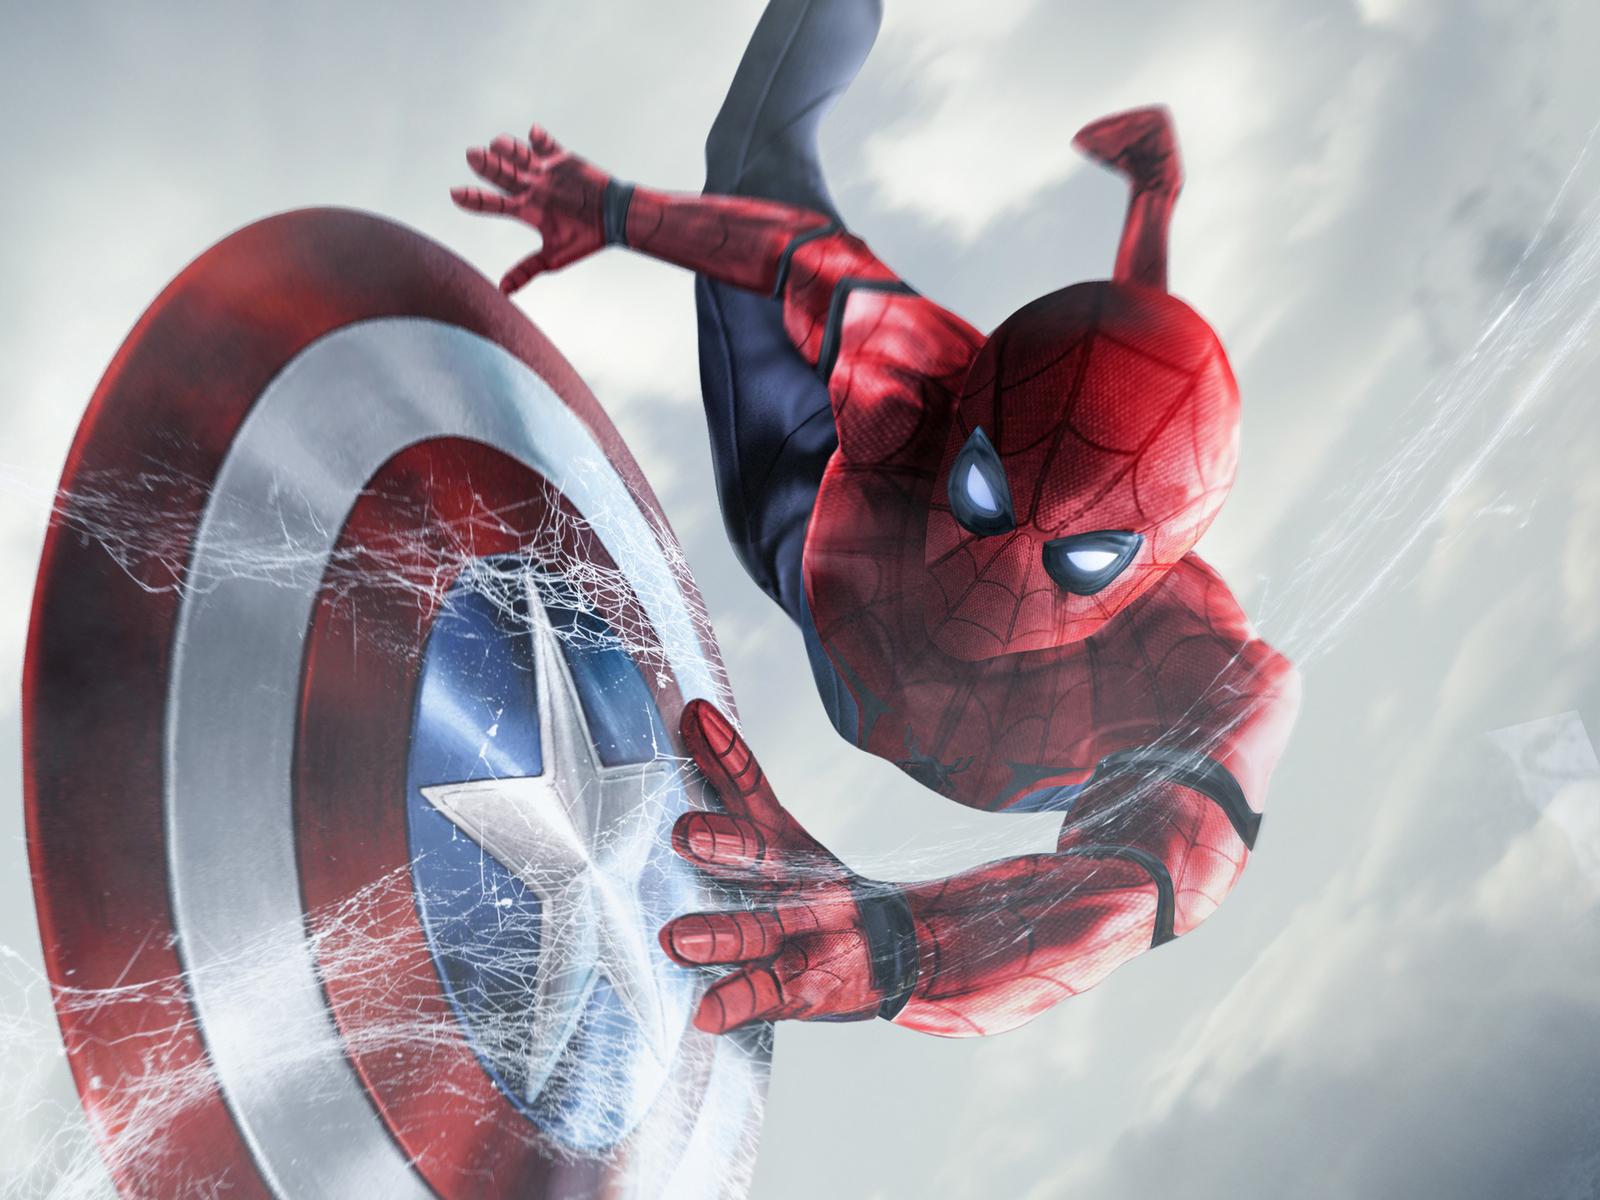 spiderman-catching-captain-america-shield-jo.jpg